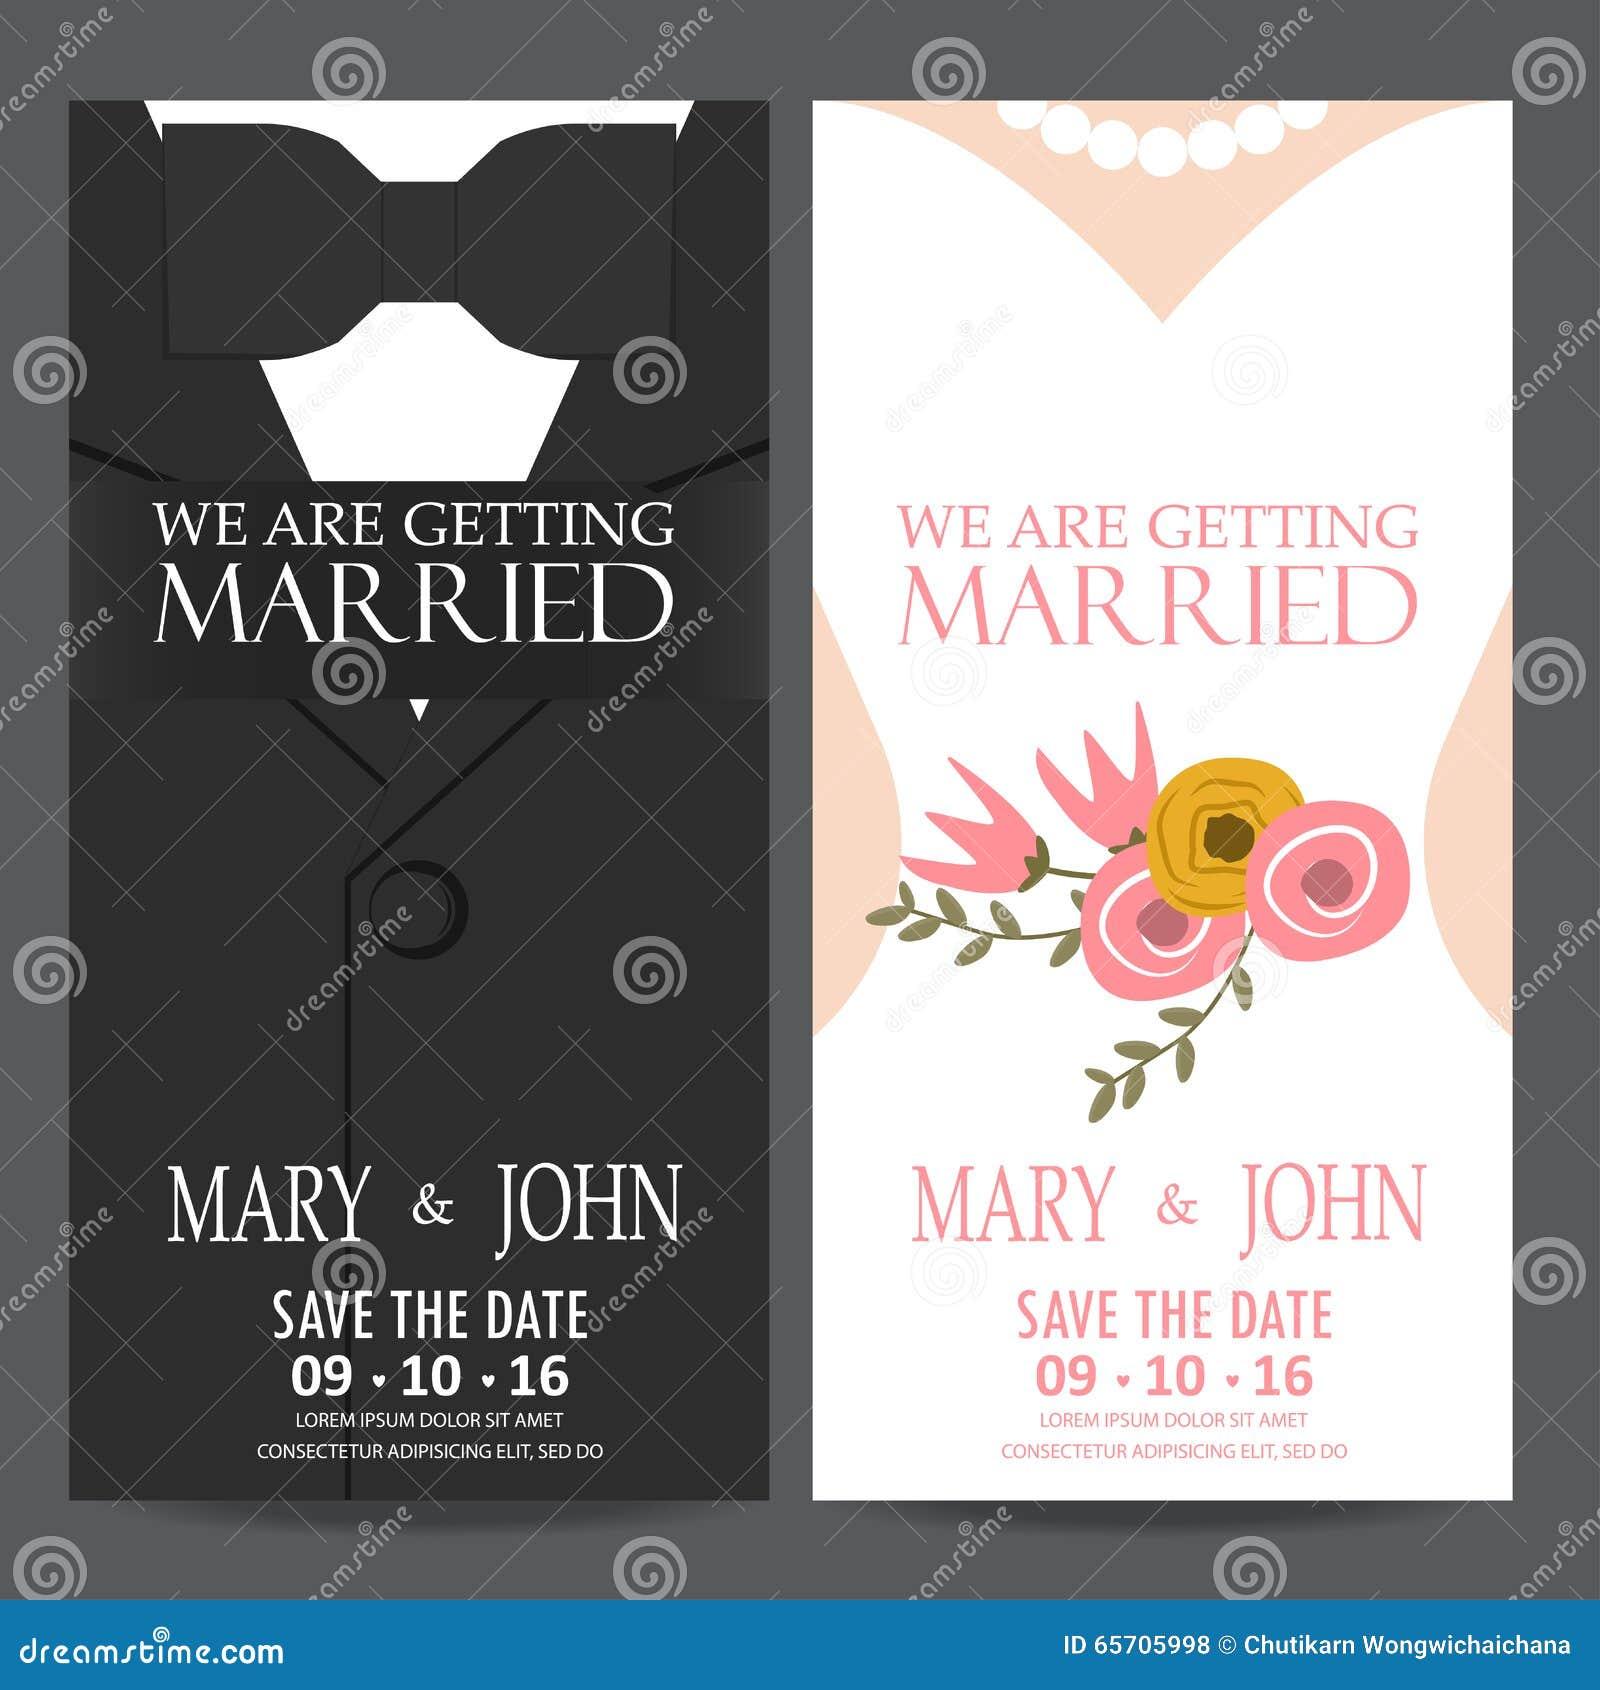 Bride And Groom,wedding Invitation Card Stock Vector - Image: 65705998